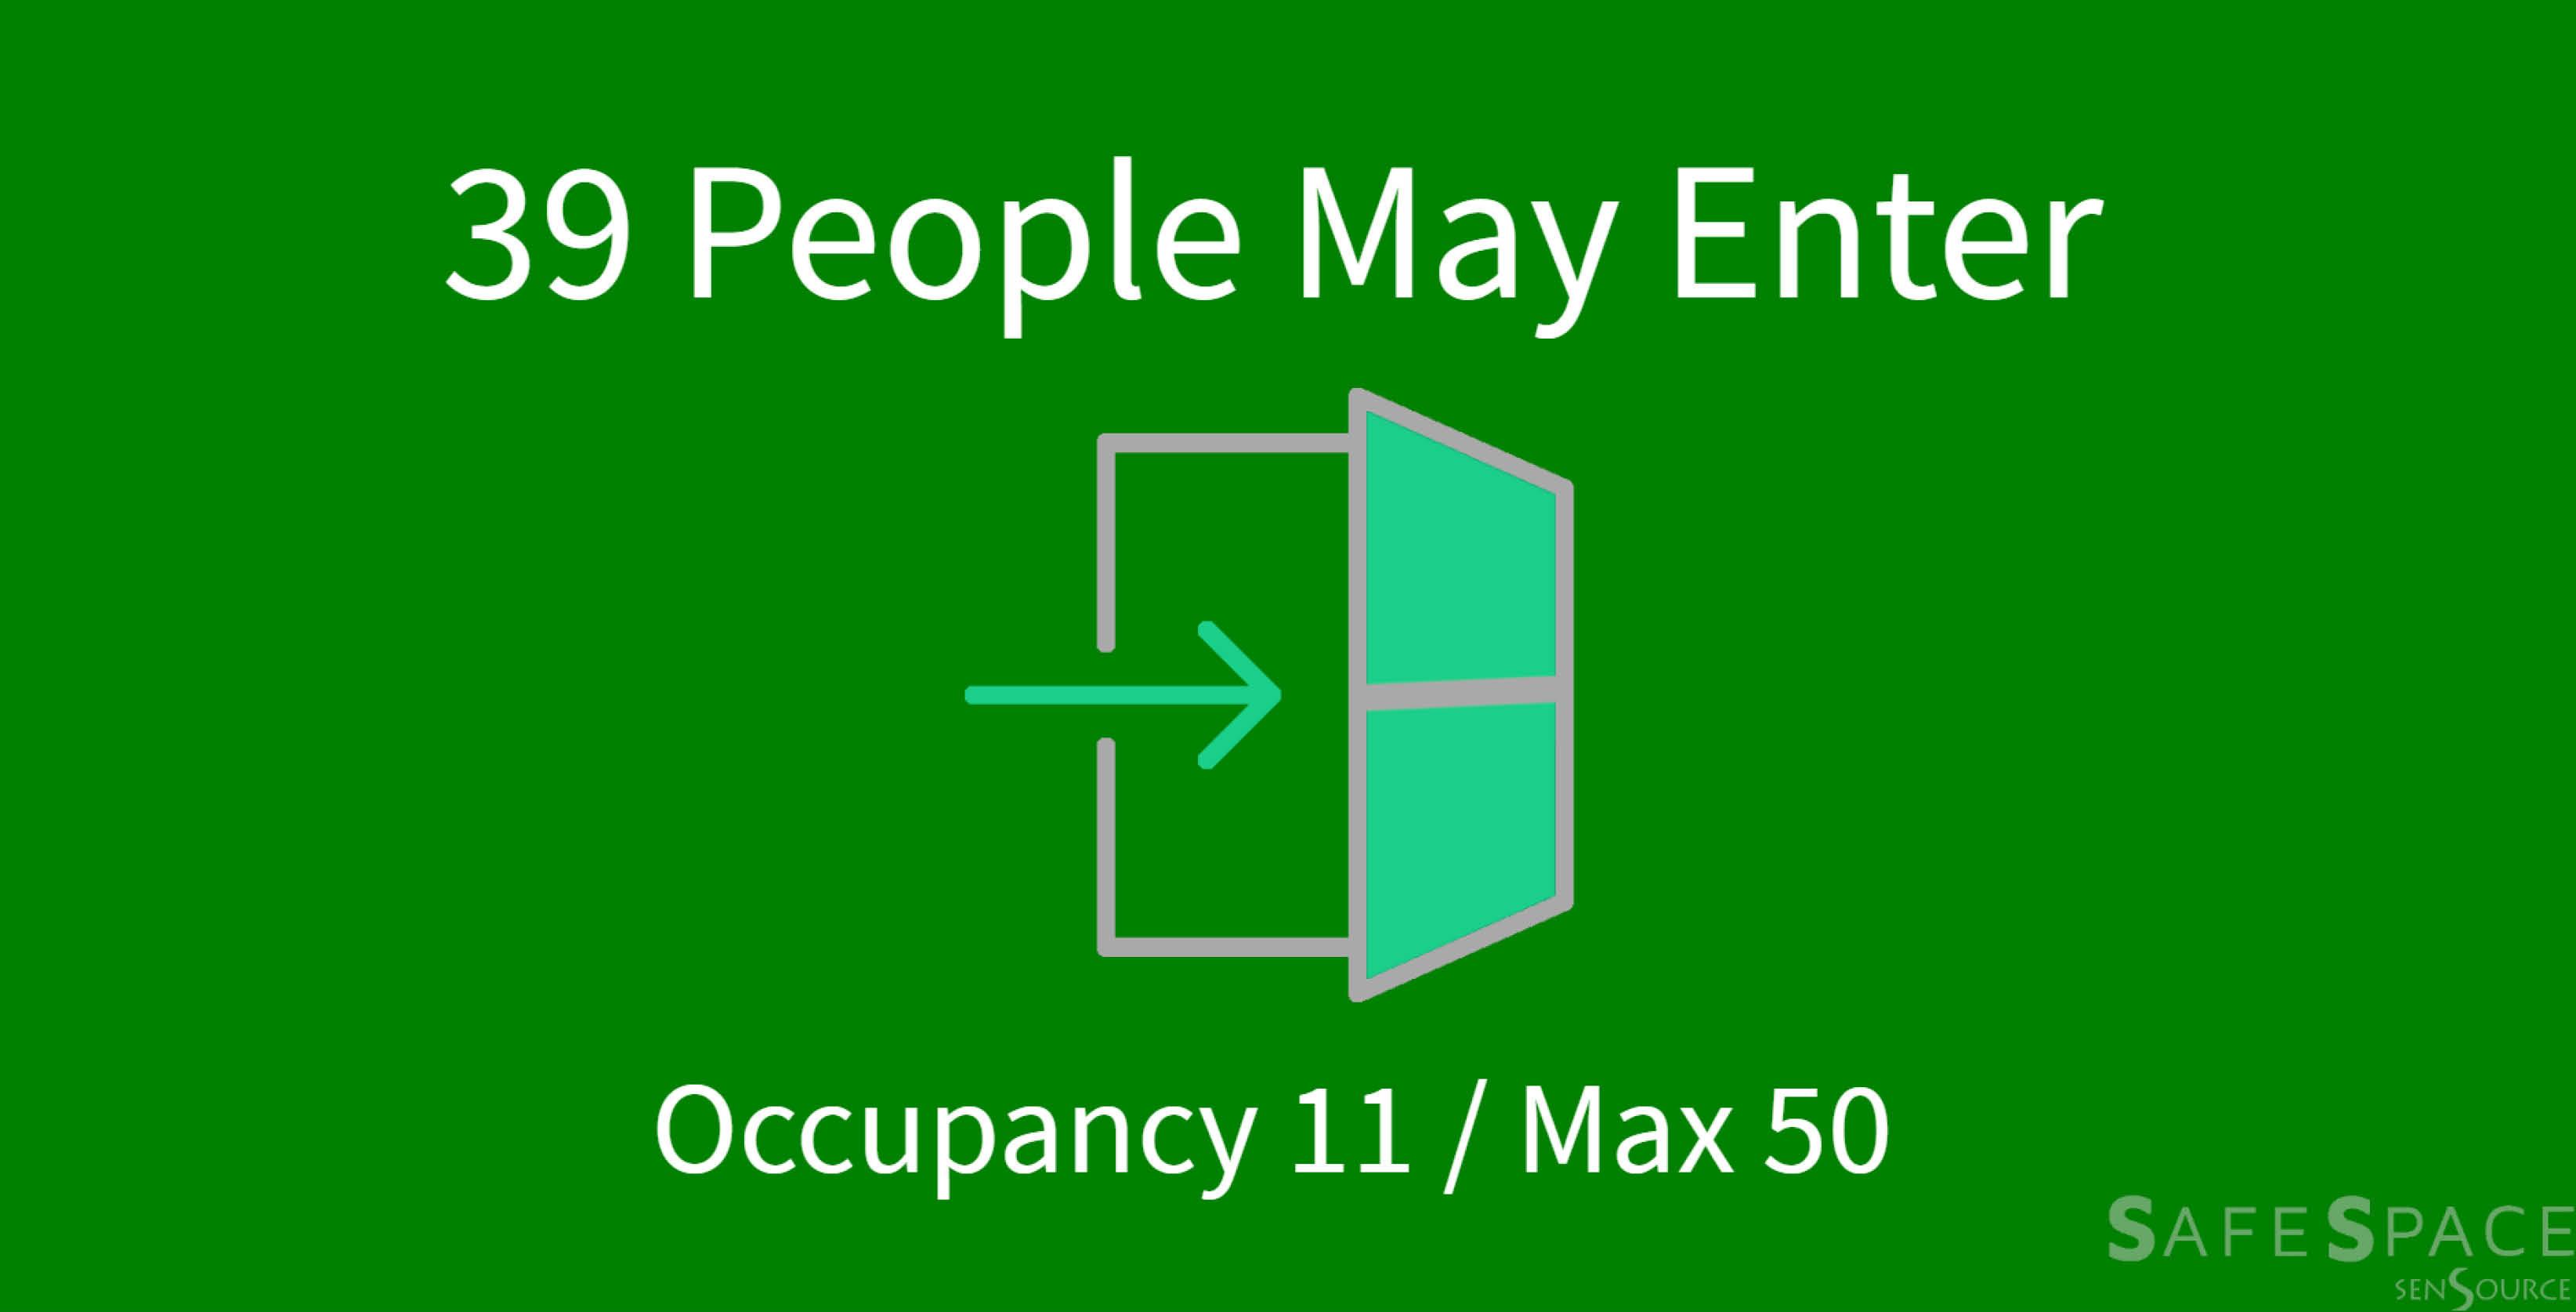 New digital display shows occupancy information